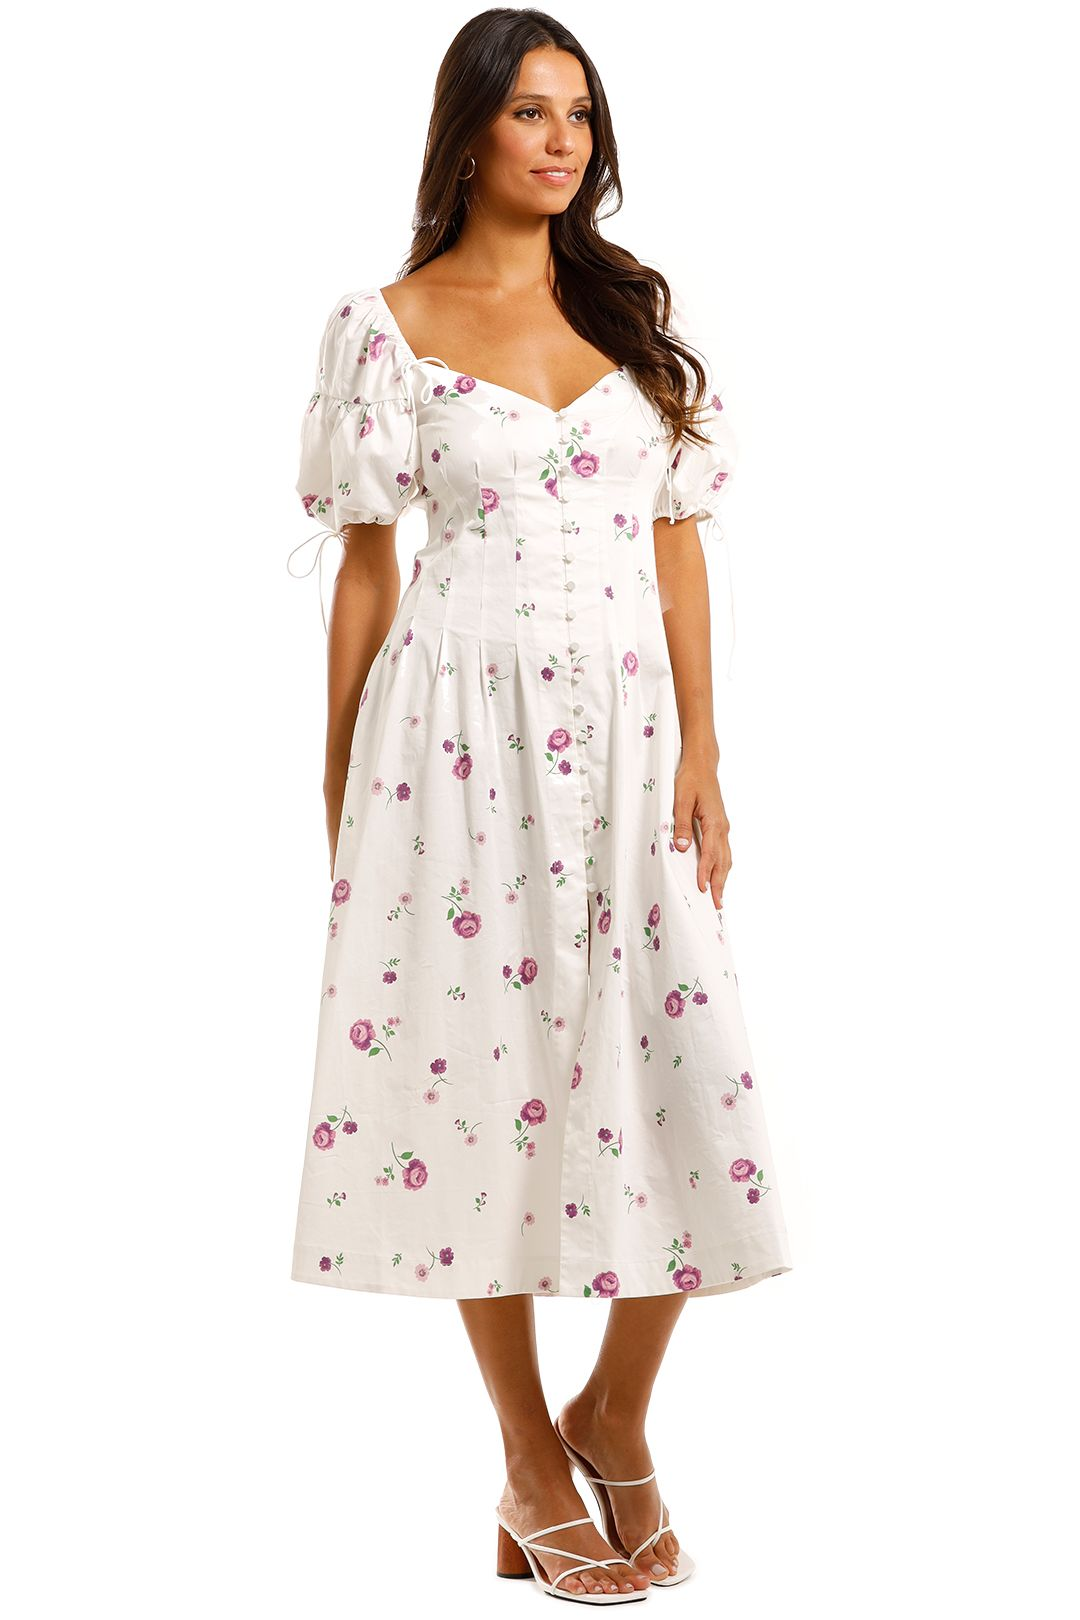 For Love and Lemons Violet Midi Dress Floral Print